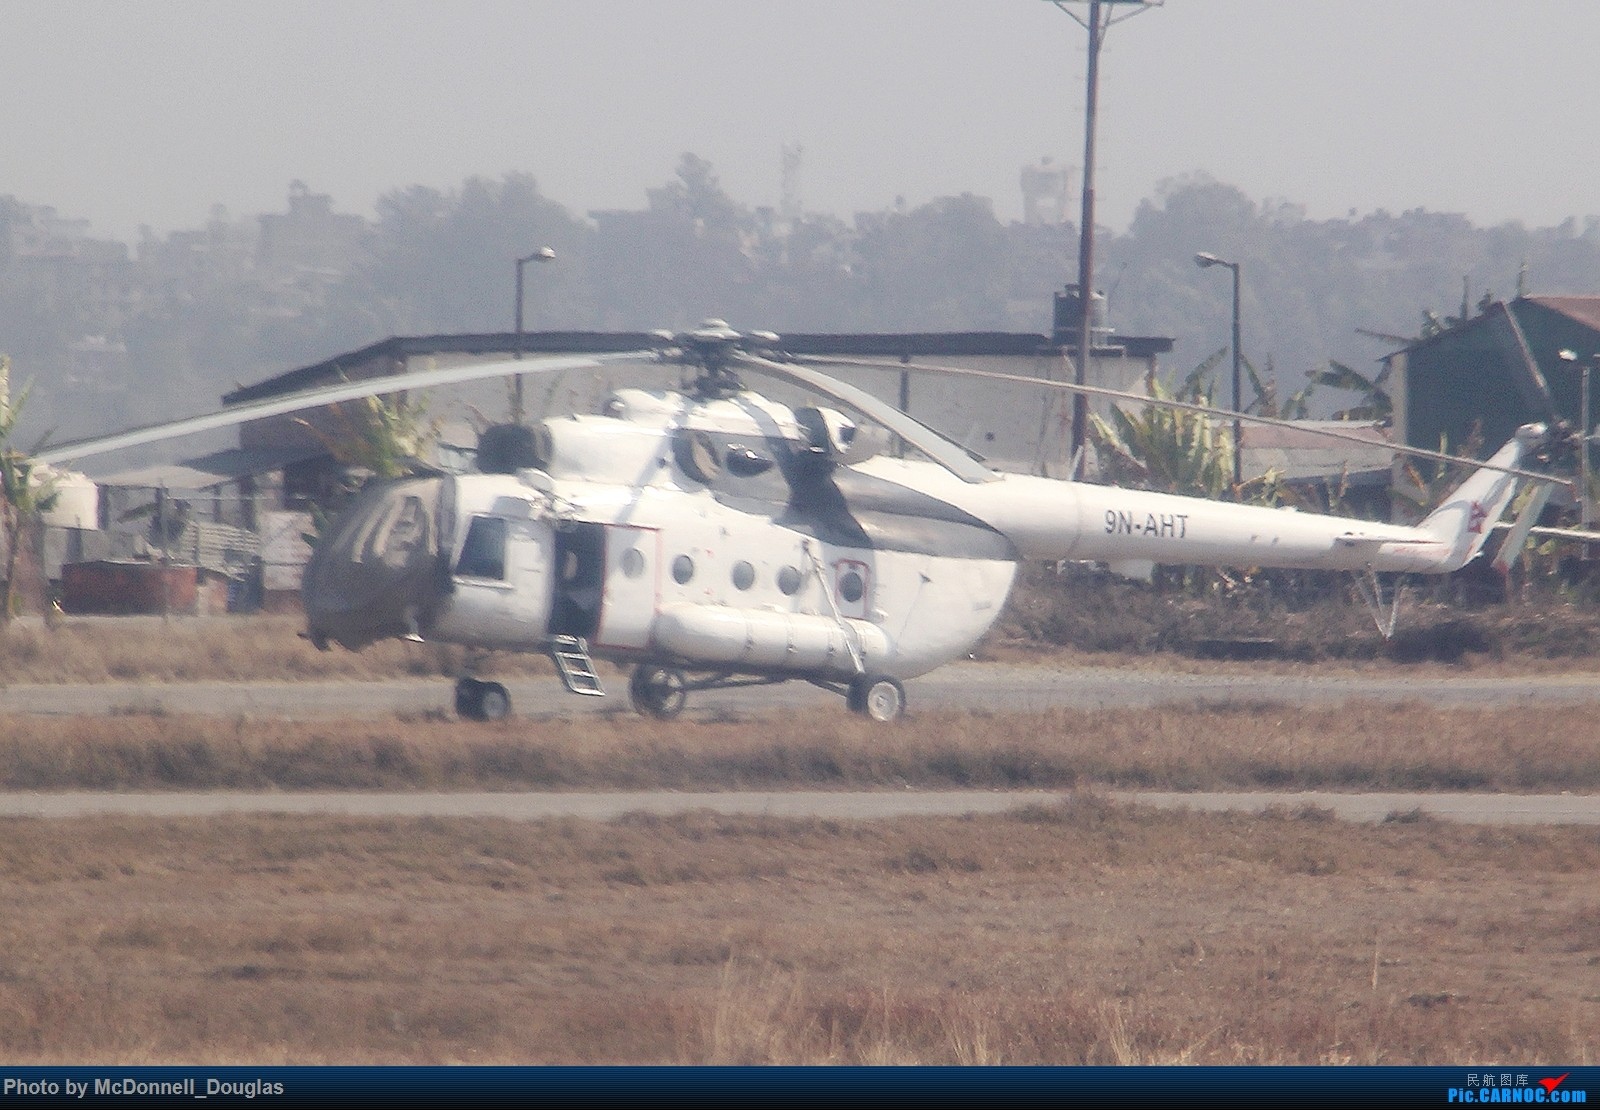 Re:[原创]【上海飞友会】【zc带你游天下(4)】不远千里飞跃喜马拉雅去看你,探寻高山另一边的神秘国度,和一群贫穷却快乐着的人们 MIL MI-8MTV-1 9N-AHT 尼泊尔加德满都特里布万国际机场